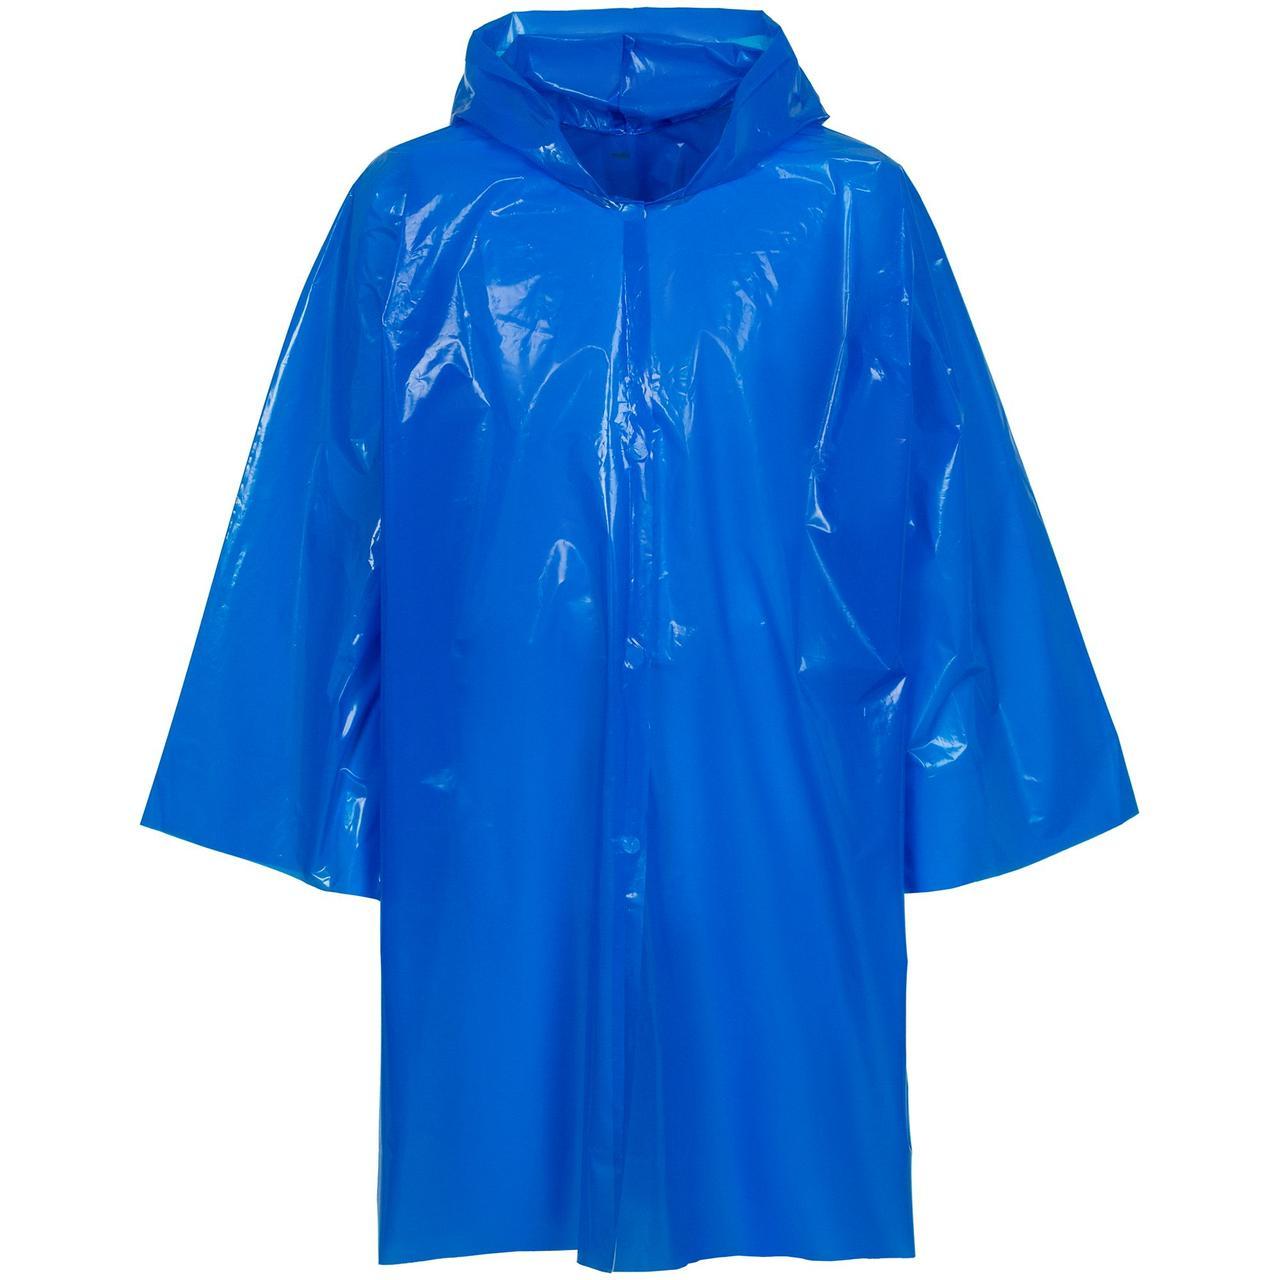 Дождевик-плащ CloudTime, синий (артикул 11876.40)